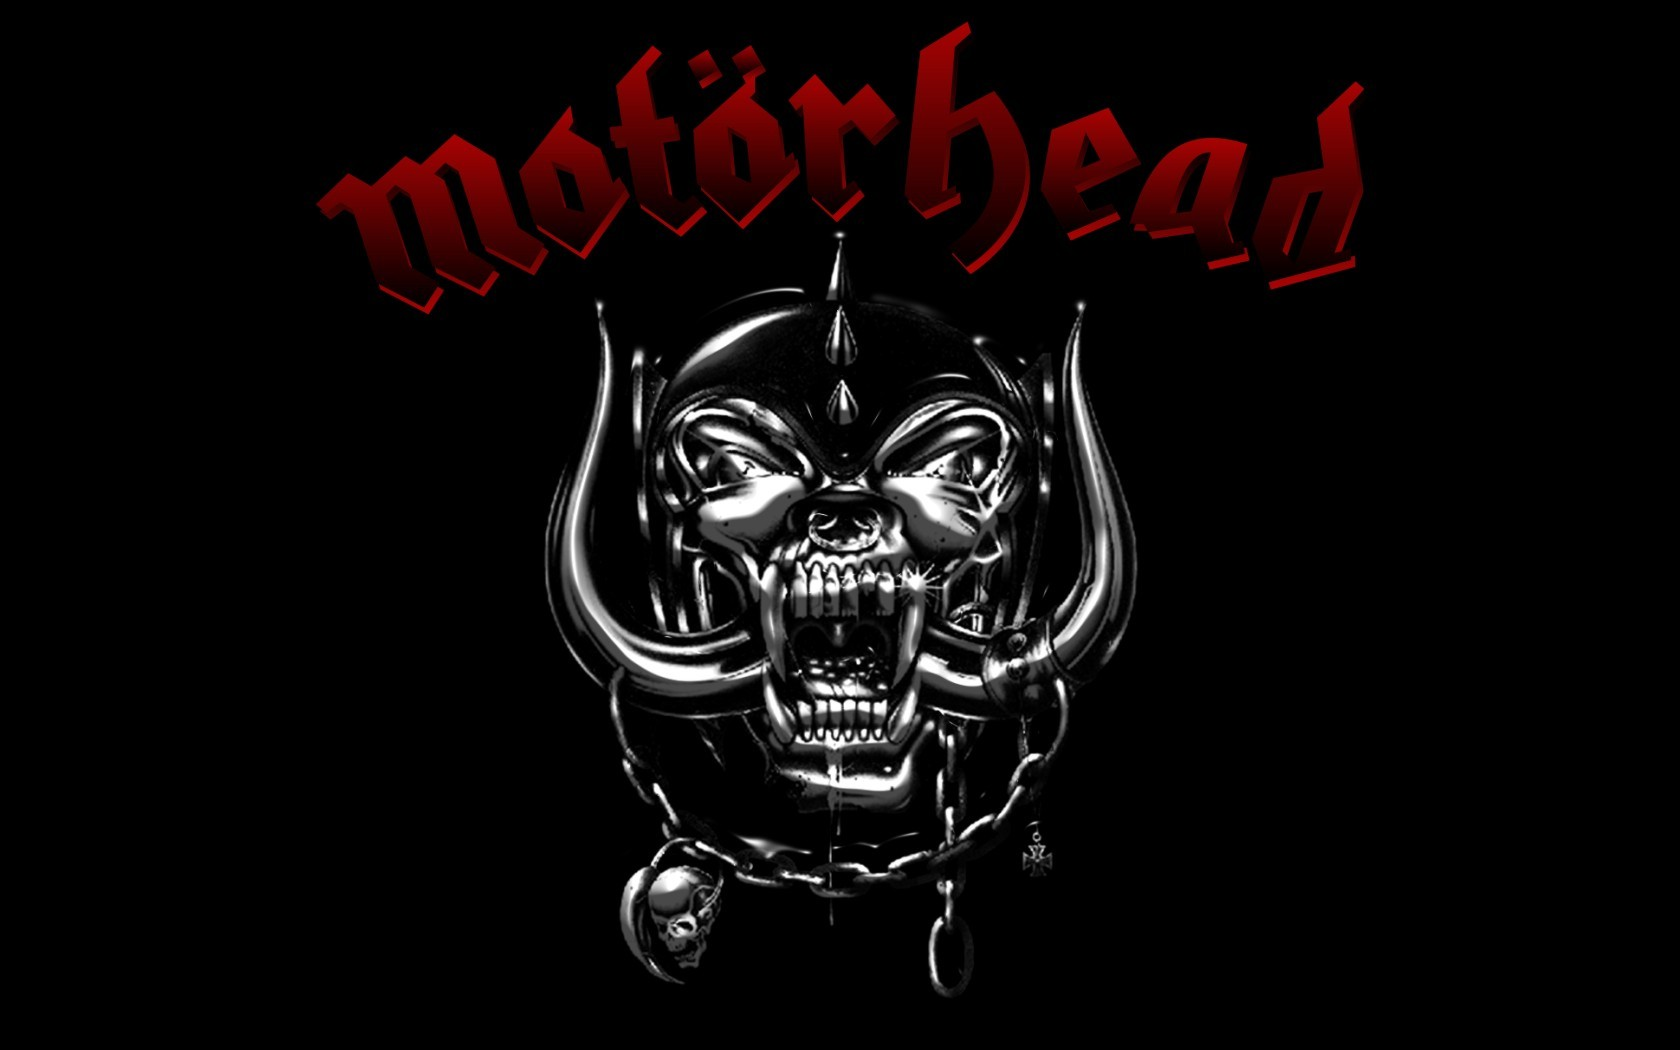 Motorhead bastards music hd wallpaper 21996 hq desktop - Motorhead Wallpaper Freequotesclub Com